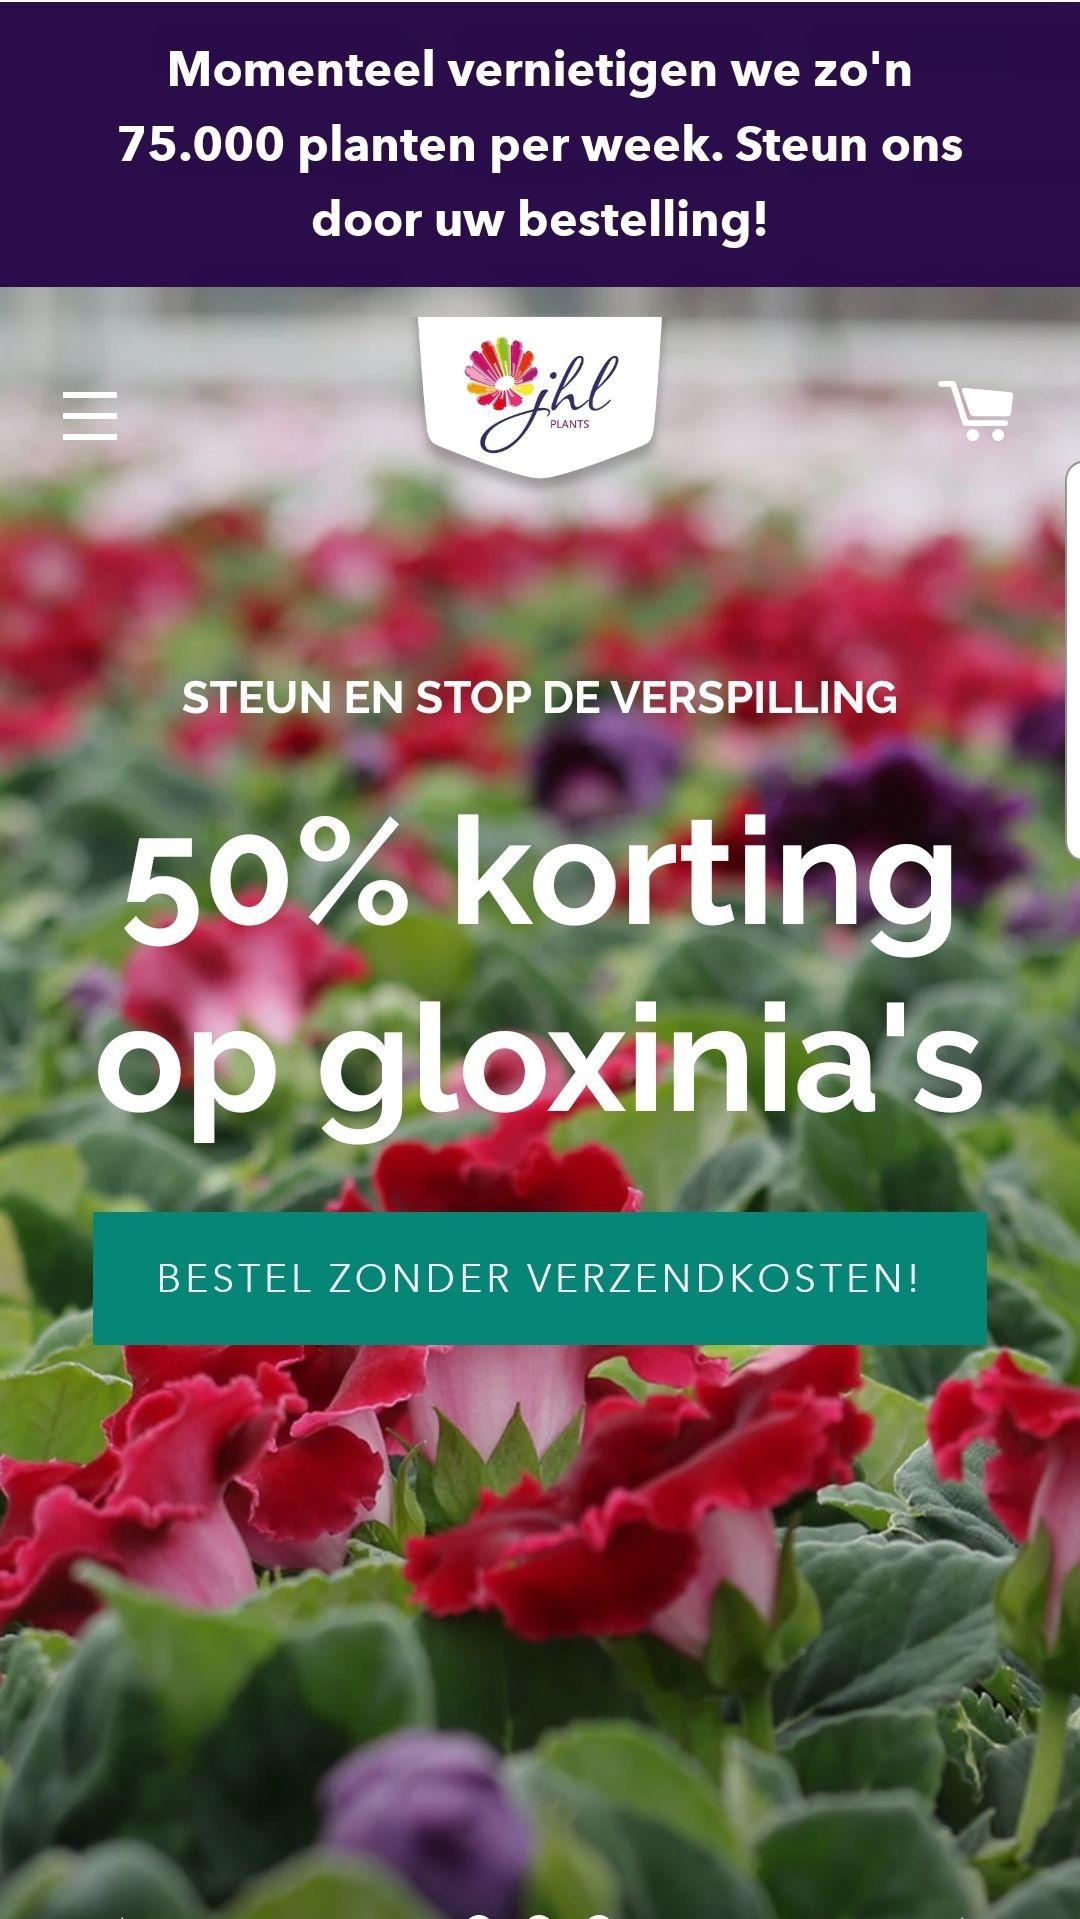 50% korting op gloxinia's (planten)